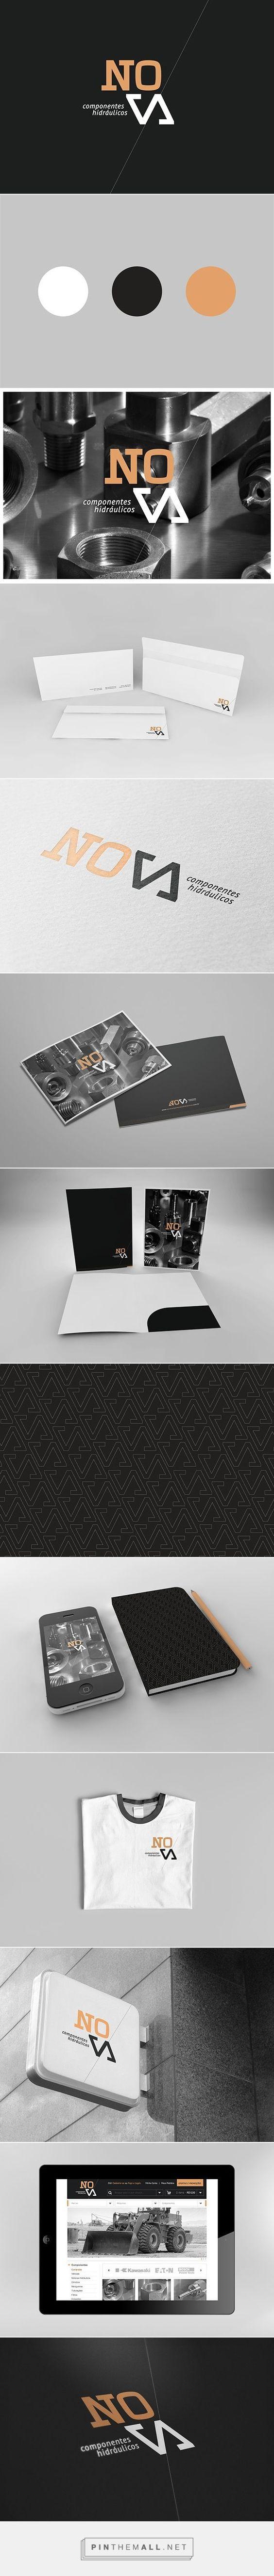 (54) Nova Corporate Identity on Behance   Fivestar Branding – Design and Branding Agency & Inspiration Gallery   Branding   Pinterest / Branding / Ideas / Inspiration / Brand / Design / Corporative / Hidraulic / Industrial / Gold / Black / Gray /